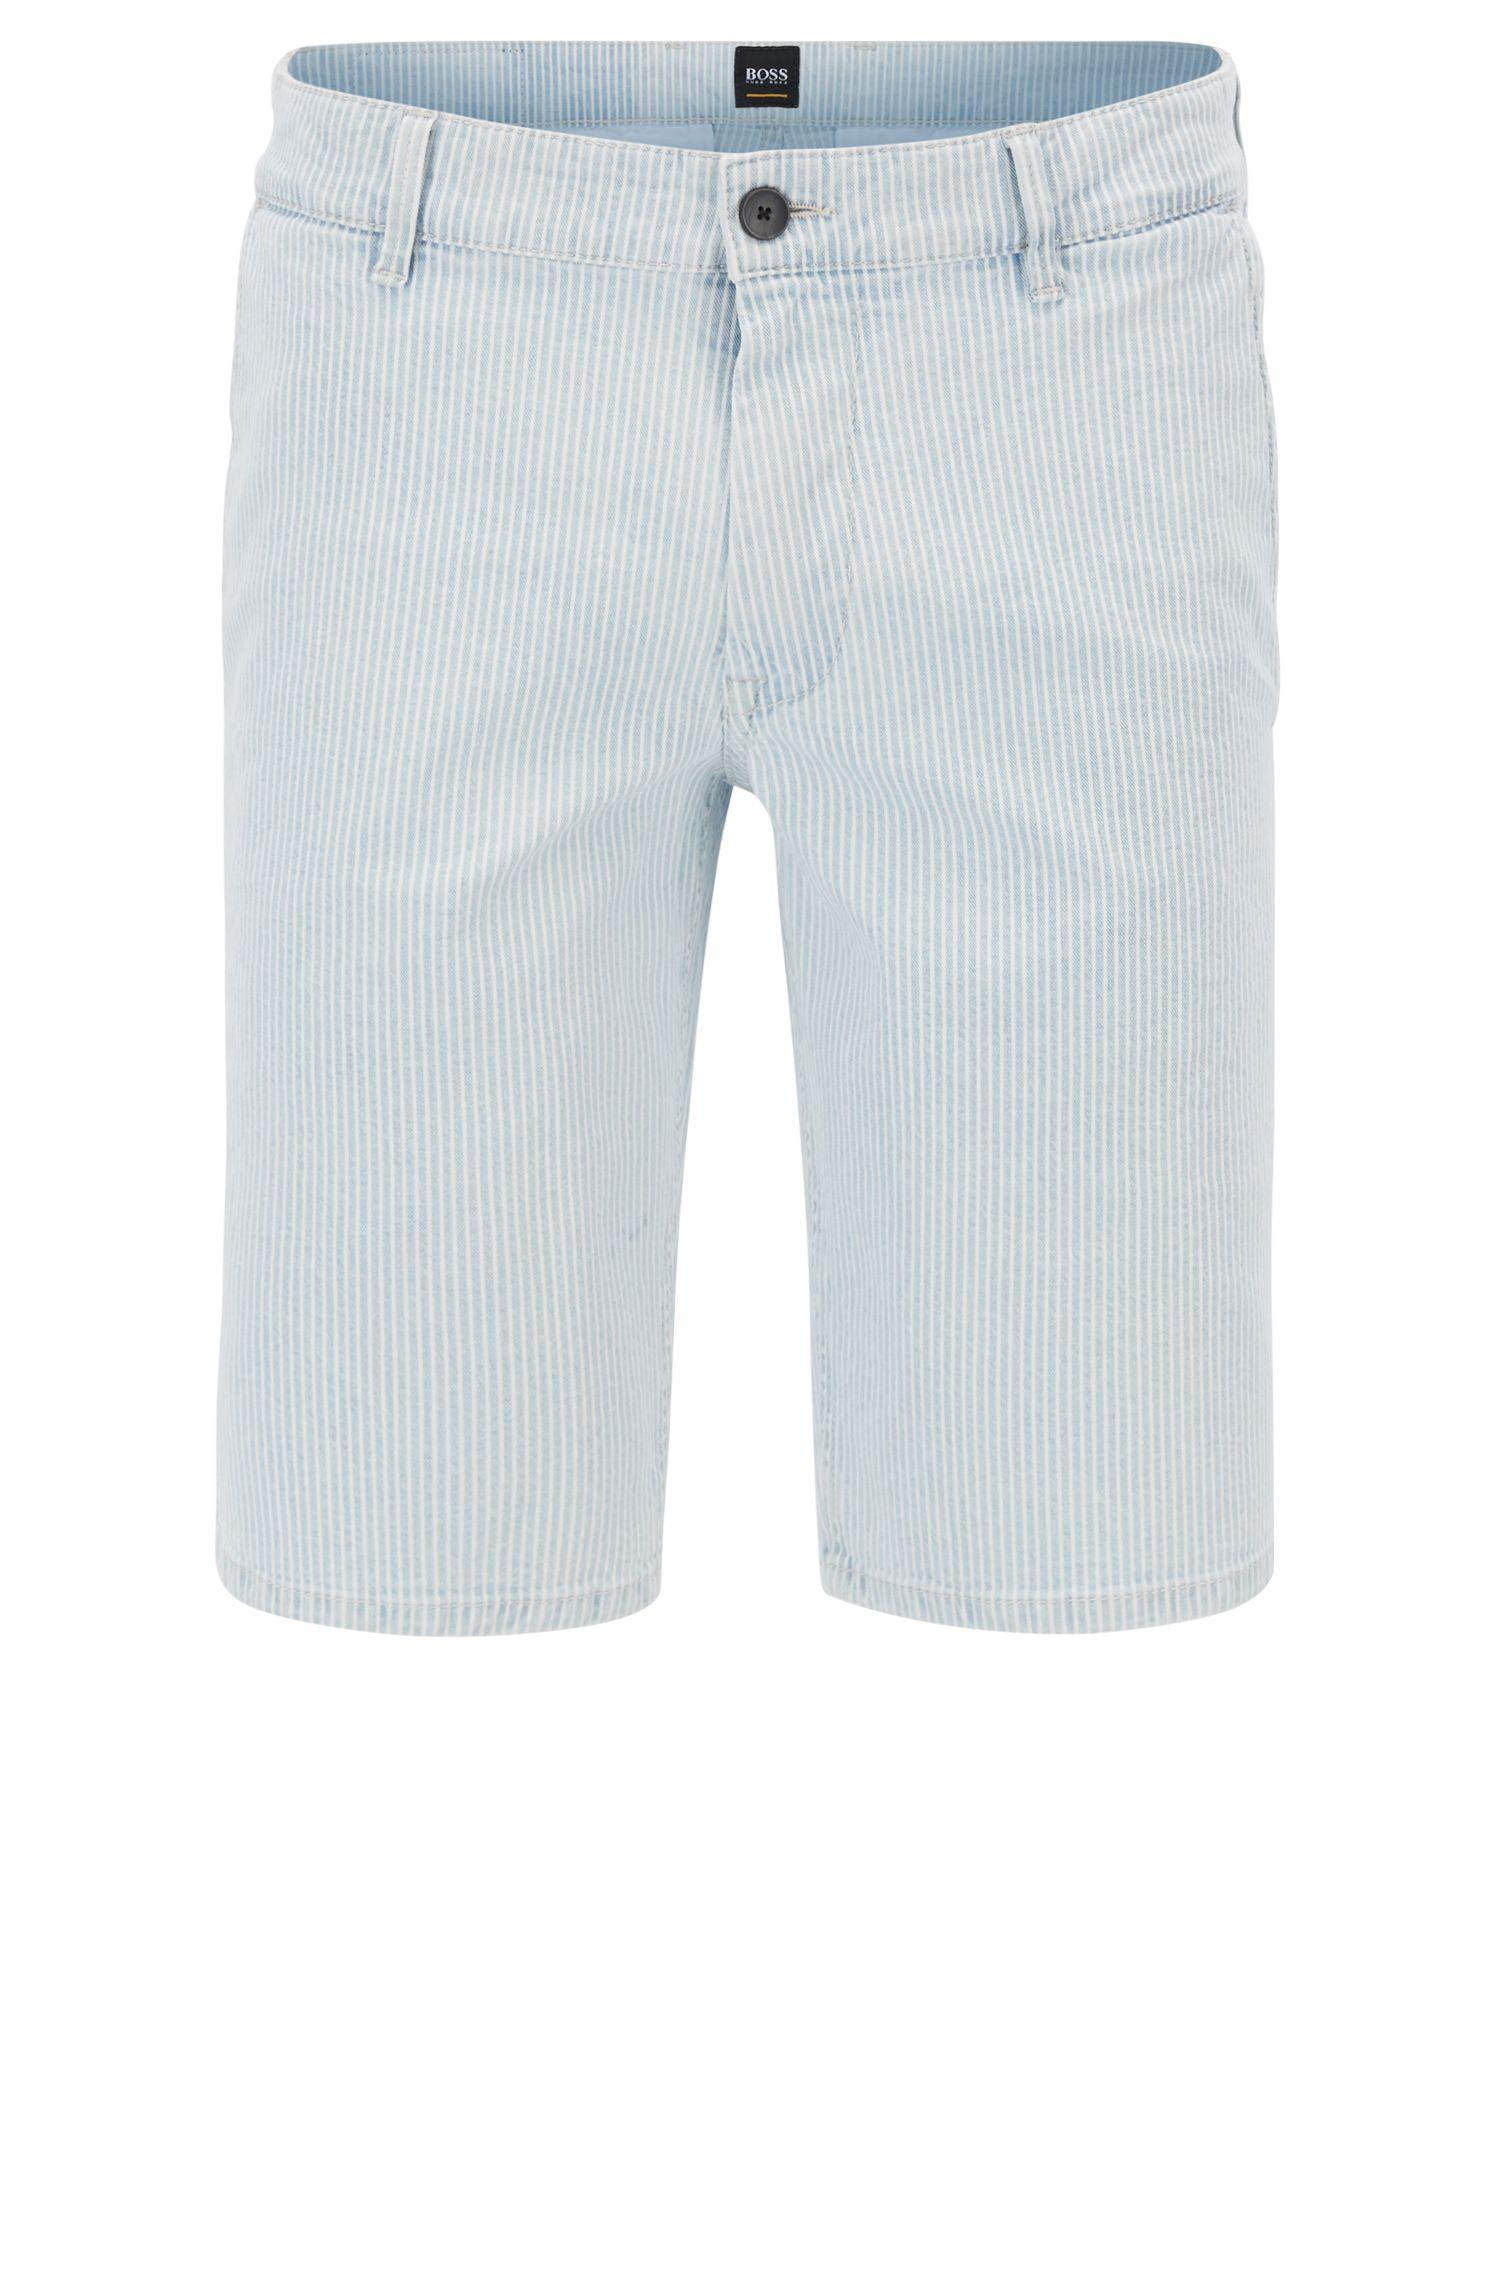 Bleached-denim shorts with diagonal stripe